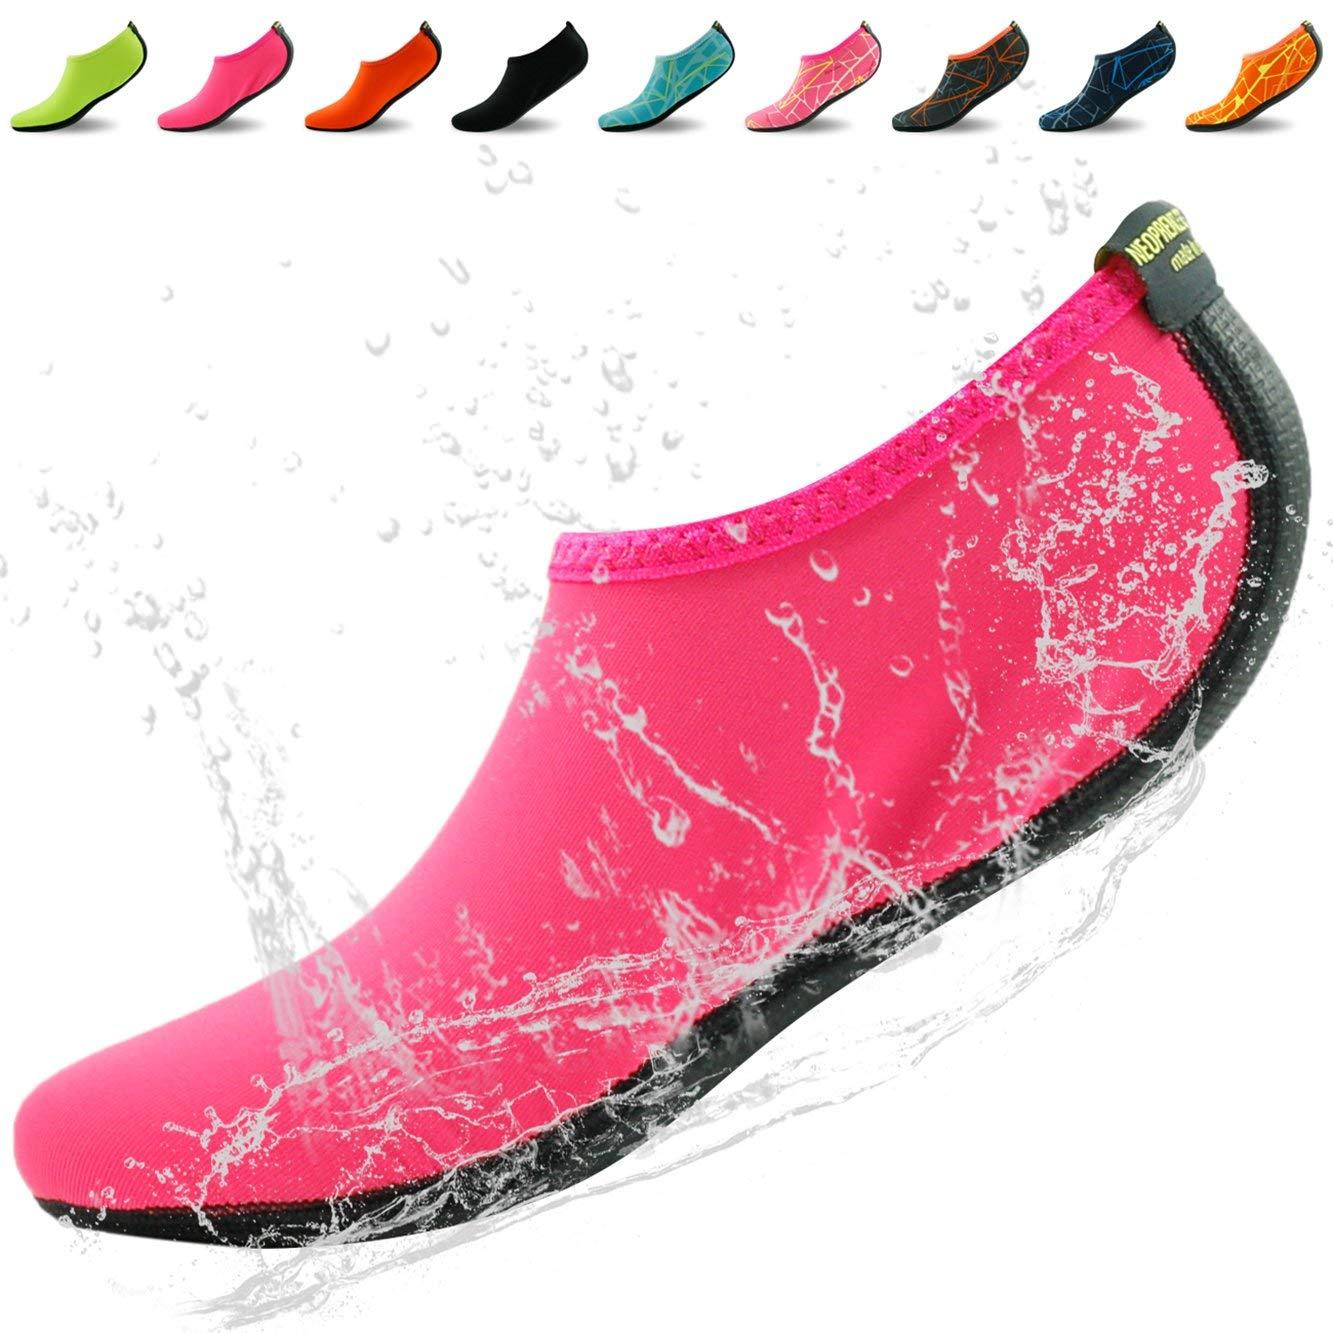 081abdd5fca1 Get Quotations · Home Slipper Unisex Water Shoes Barefoot Skin Aqua Shoes  Neoprene Socks Beach Swim Surf Yoga